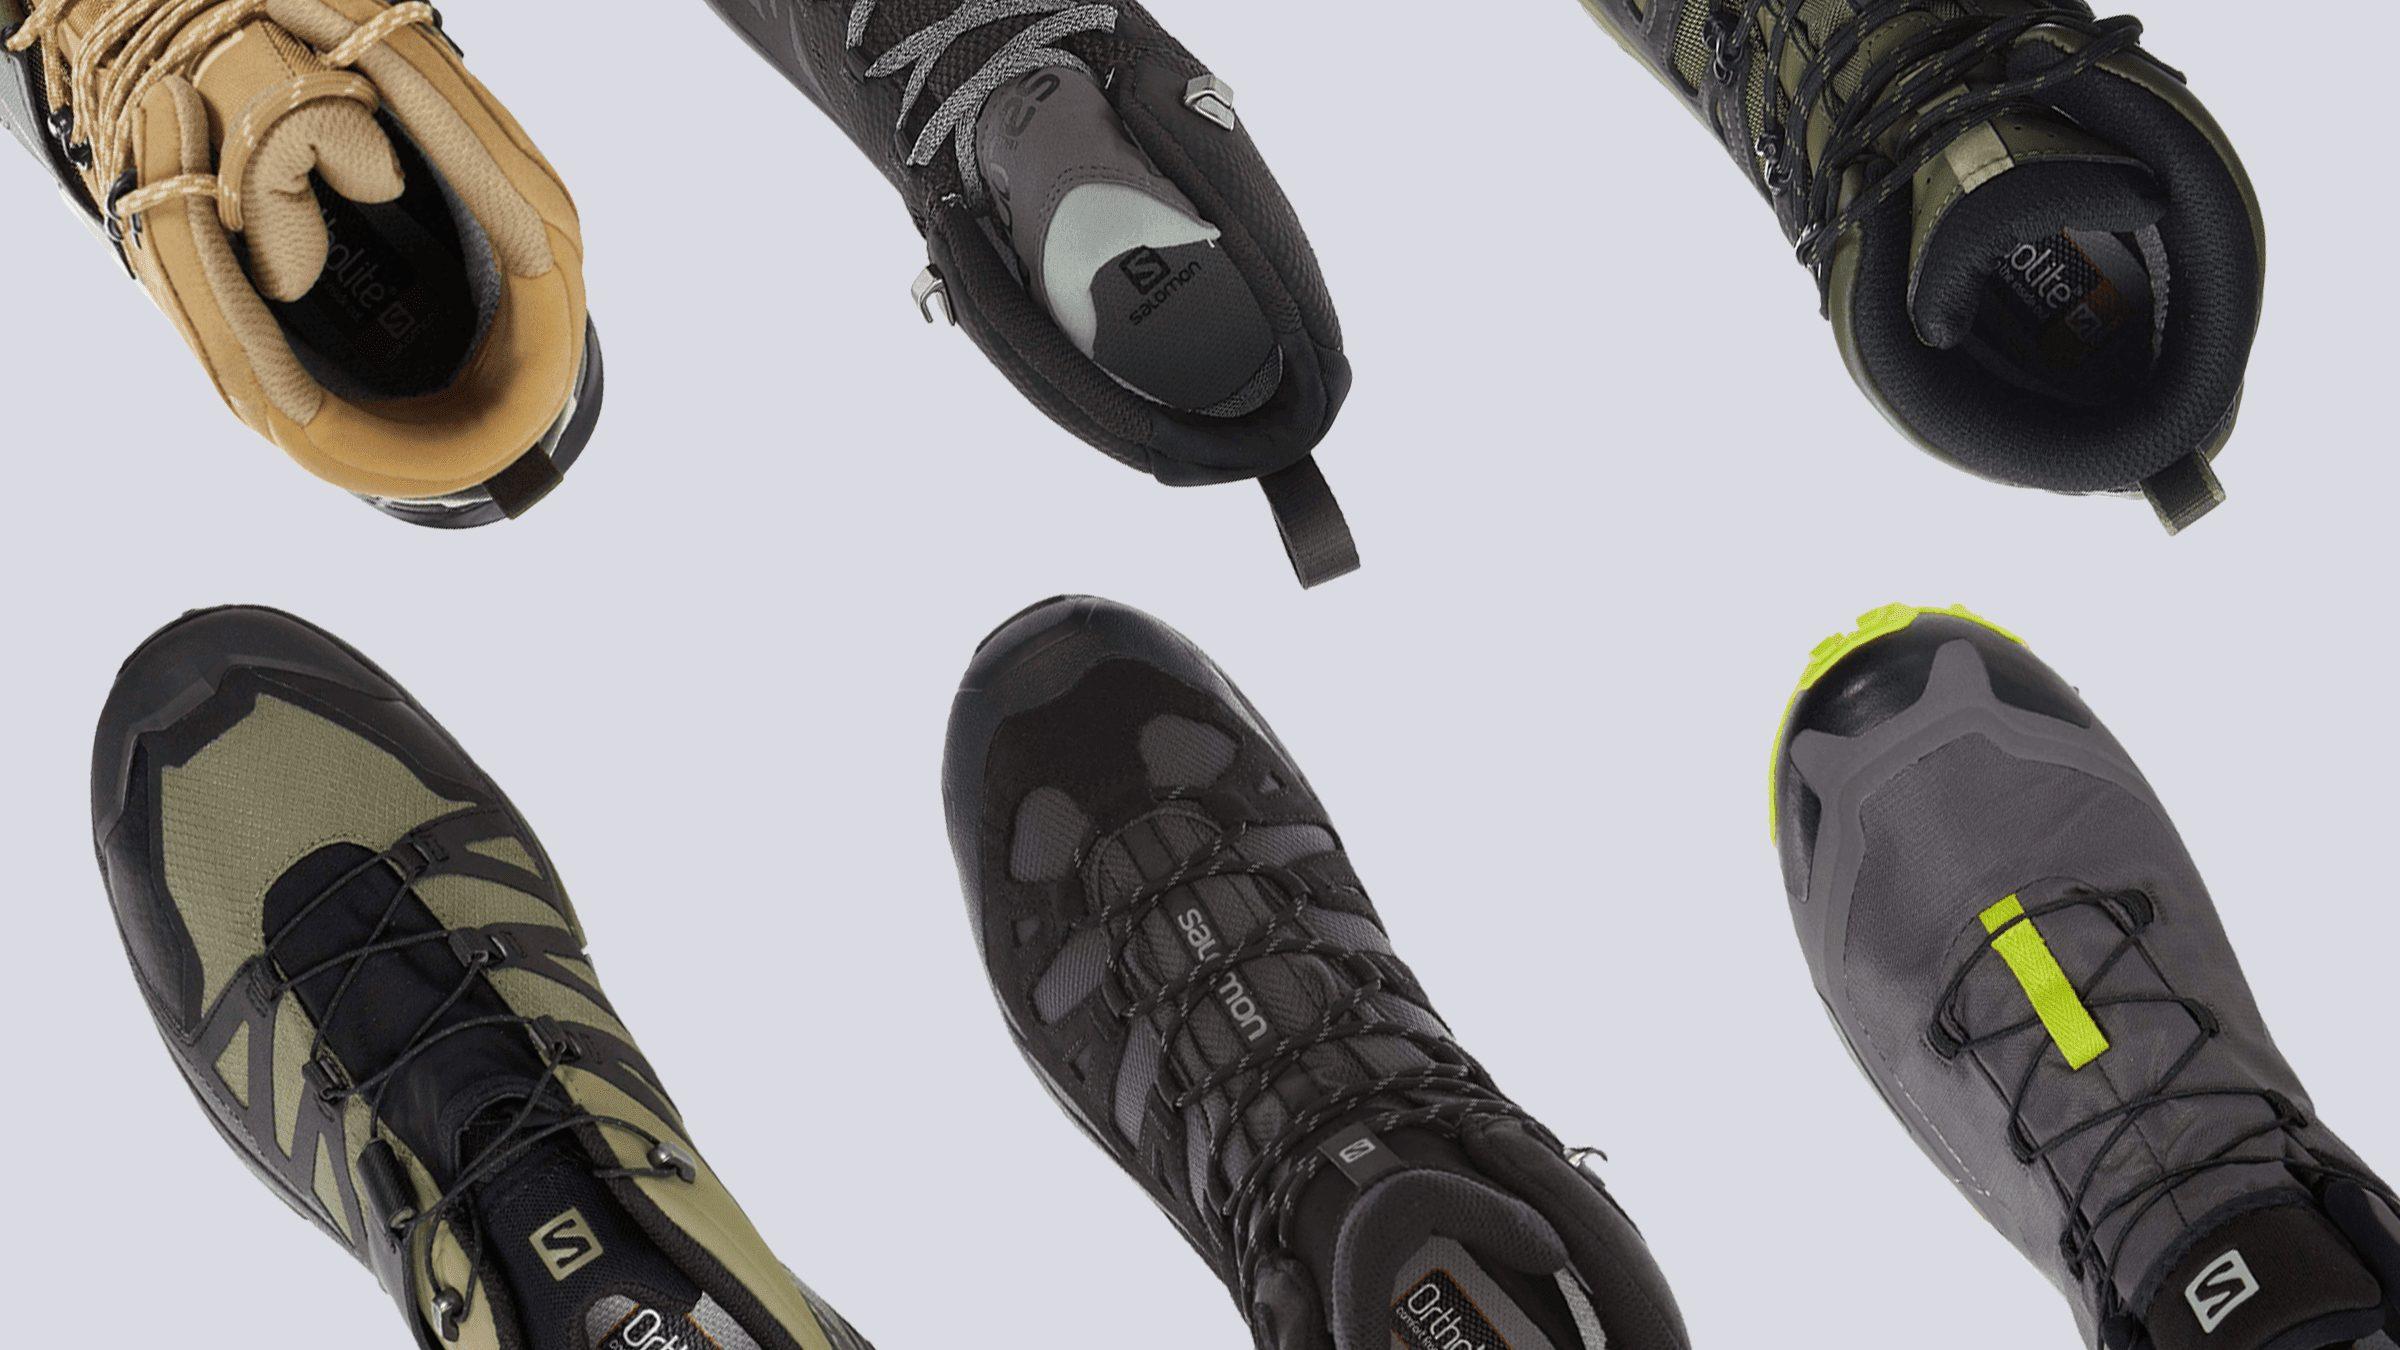 10 Best Salomon Hiking Boots in 2021